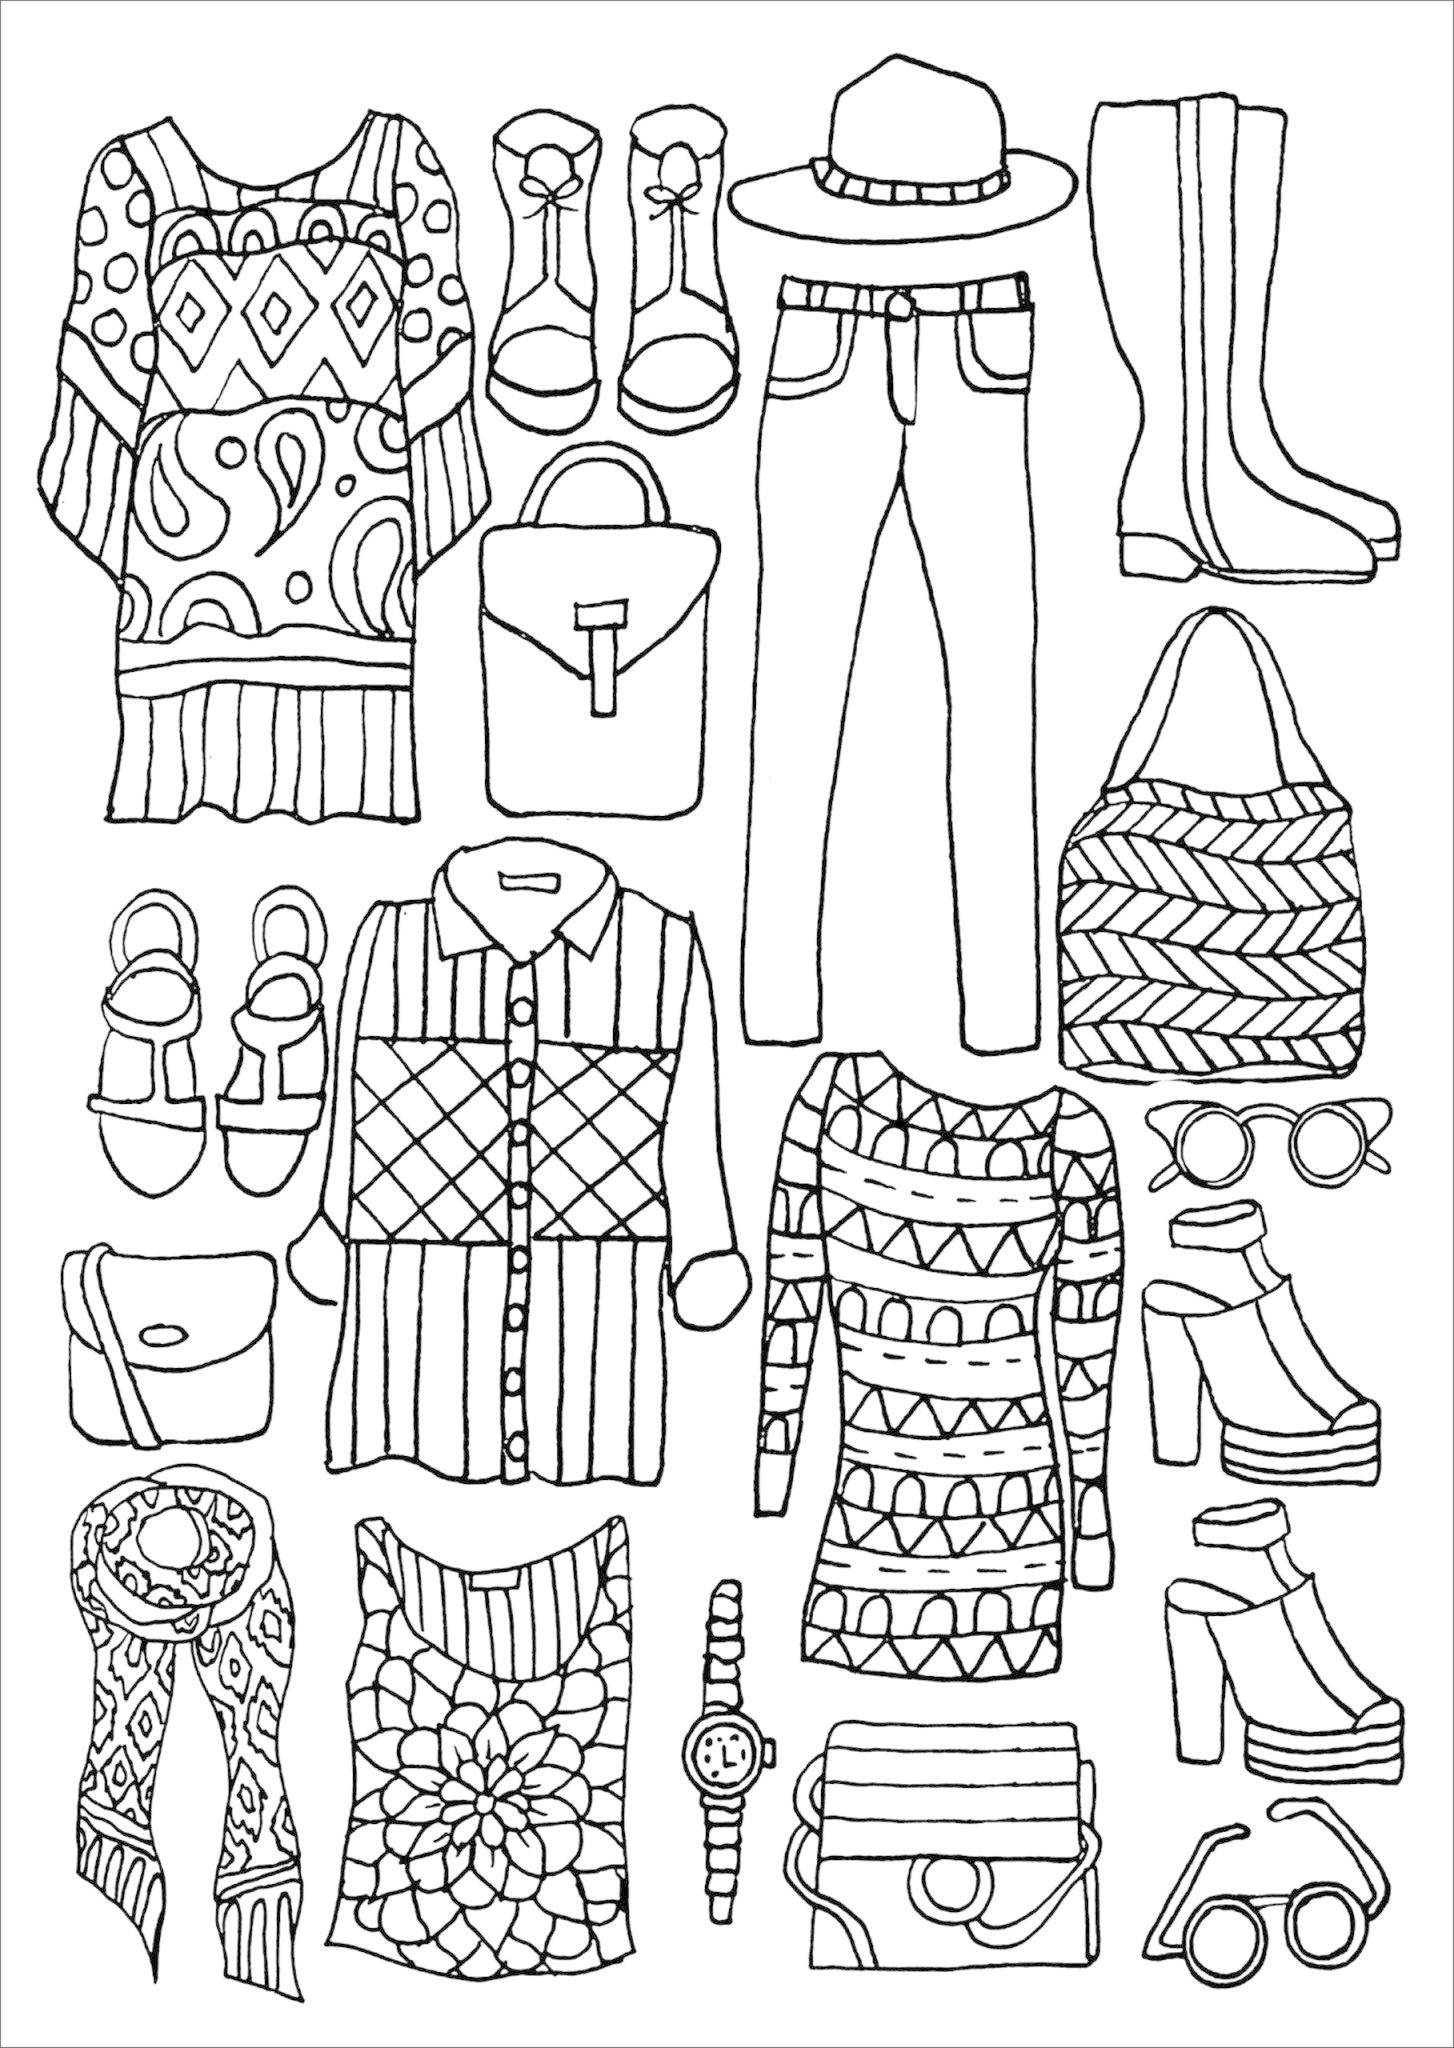 Fashion - Artist's Coloring Book